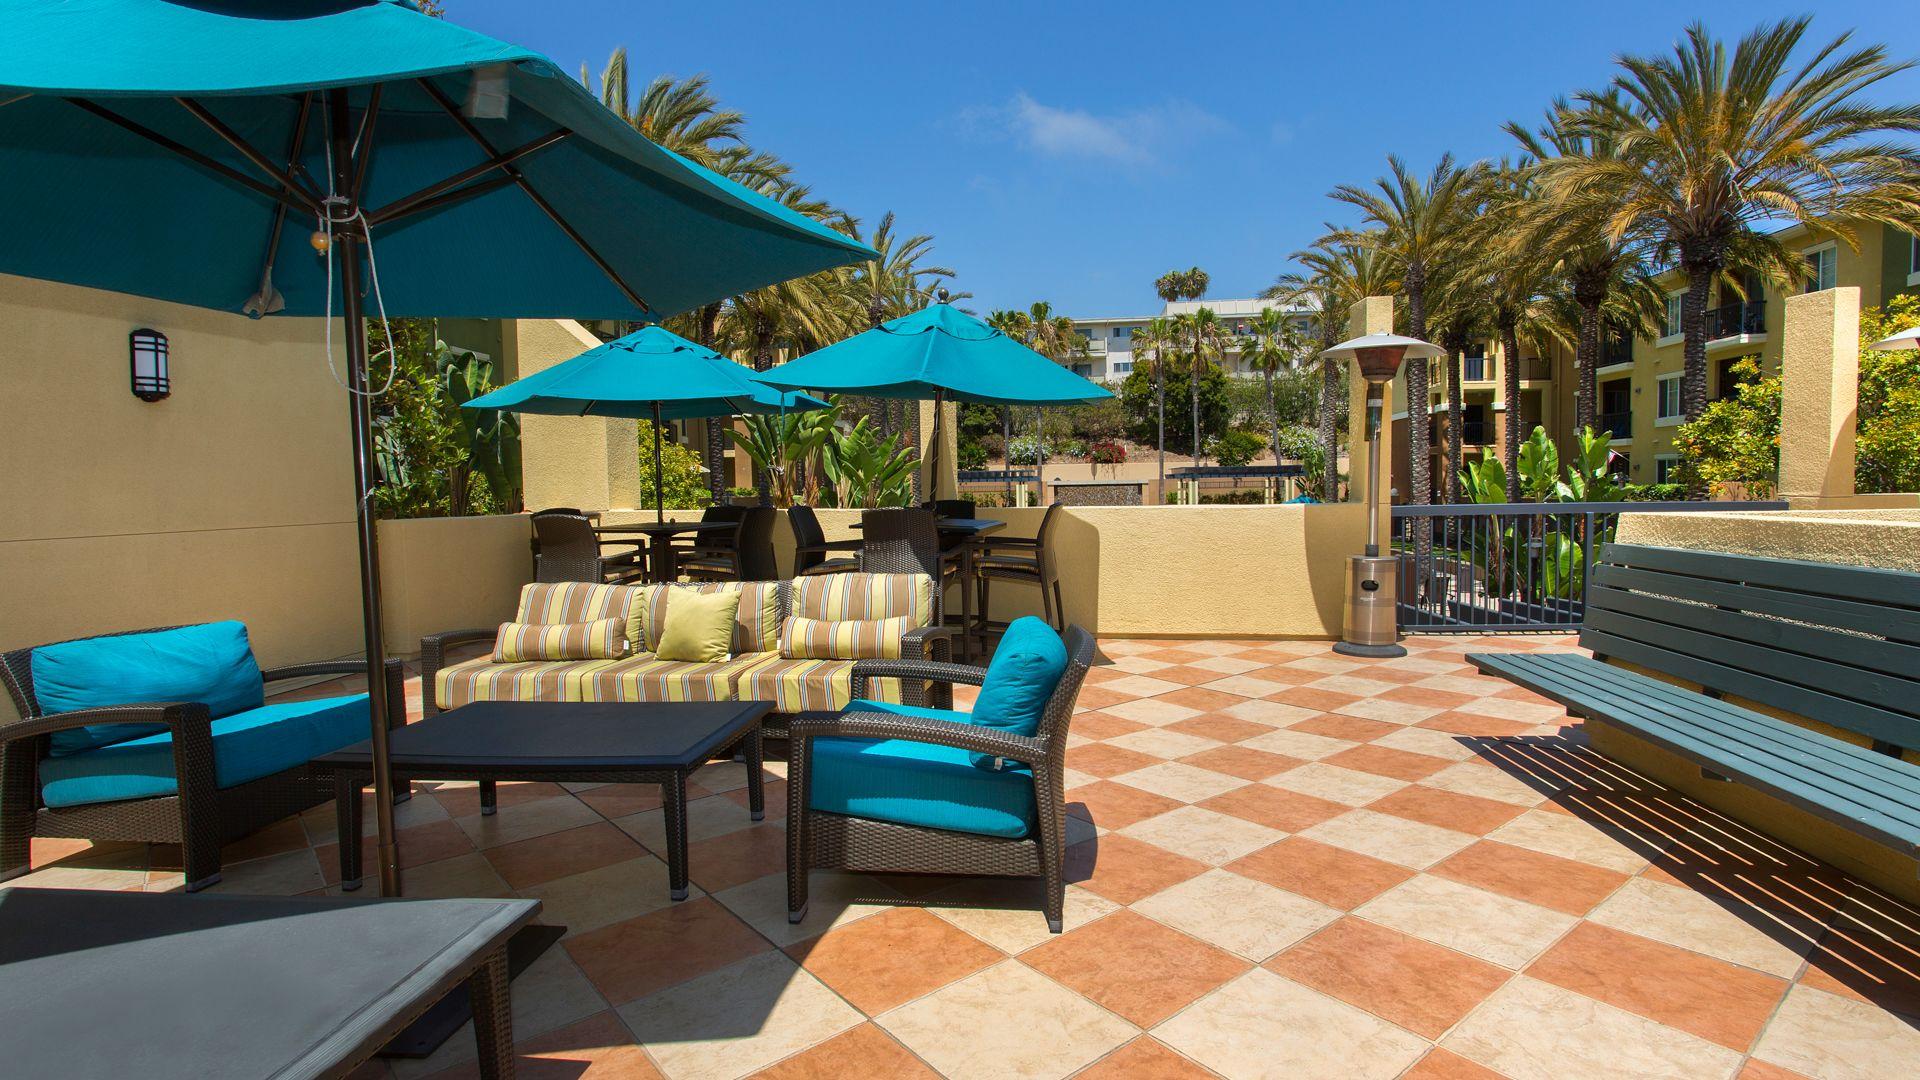 Mariposa at Playa del Rey Apartments - Sun Deck